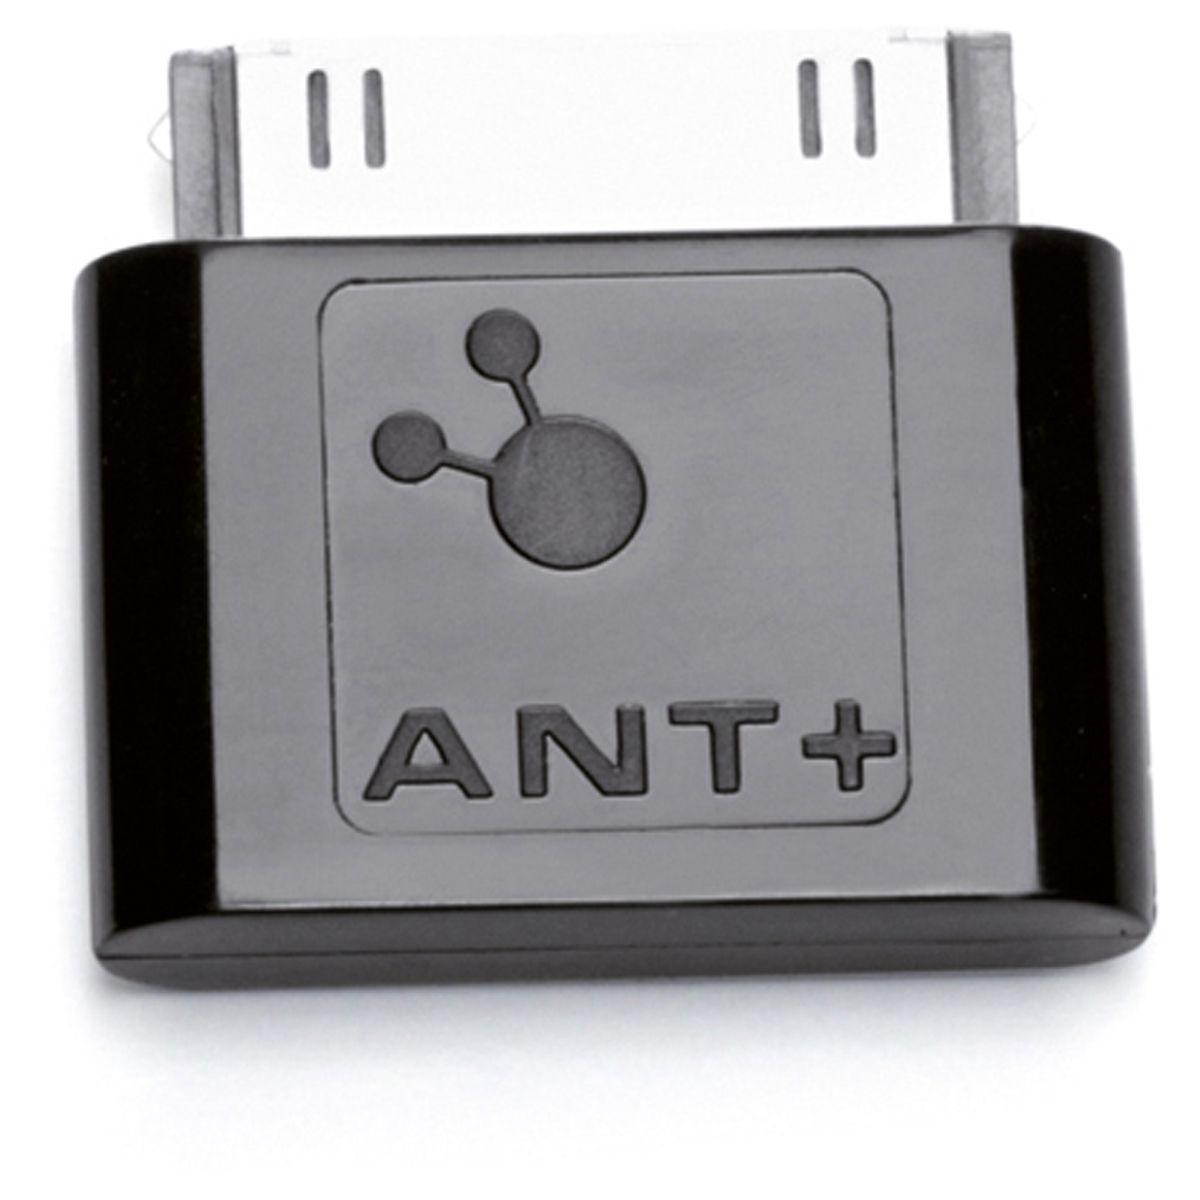 Elite Dongle Apple Ant +